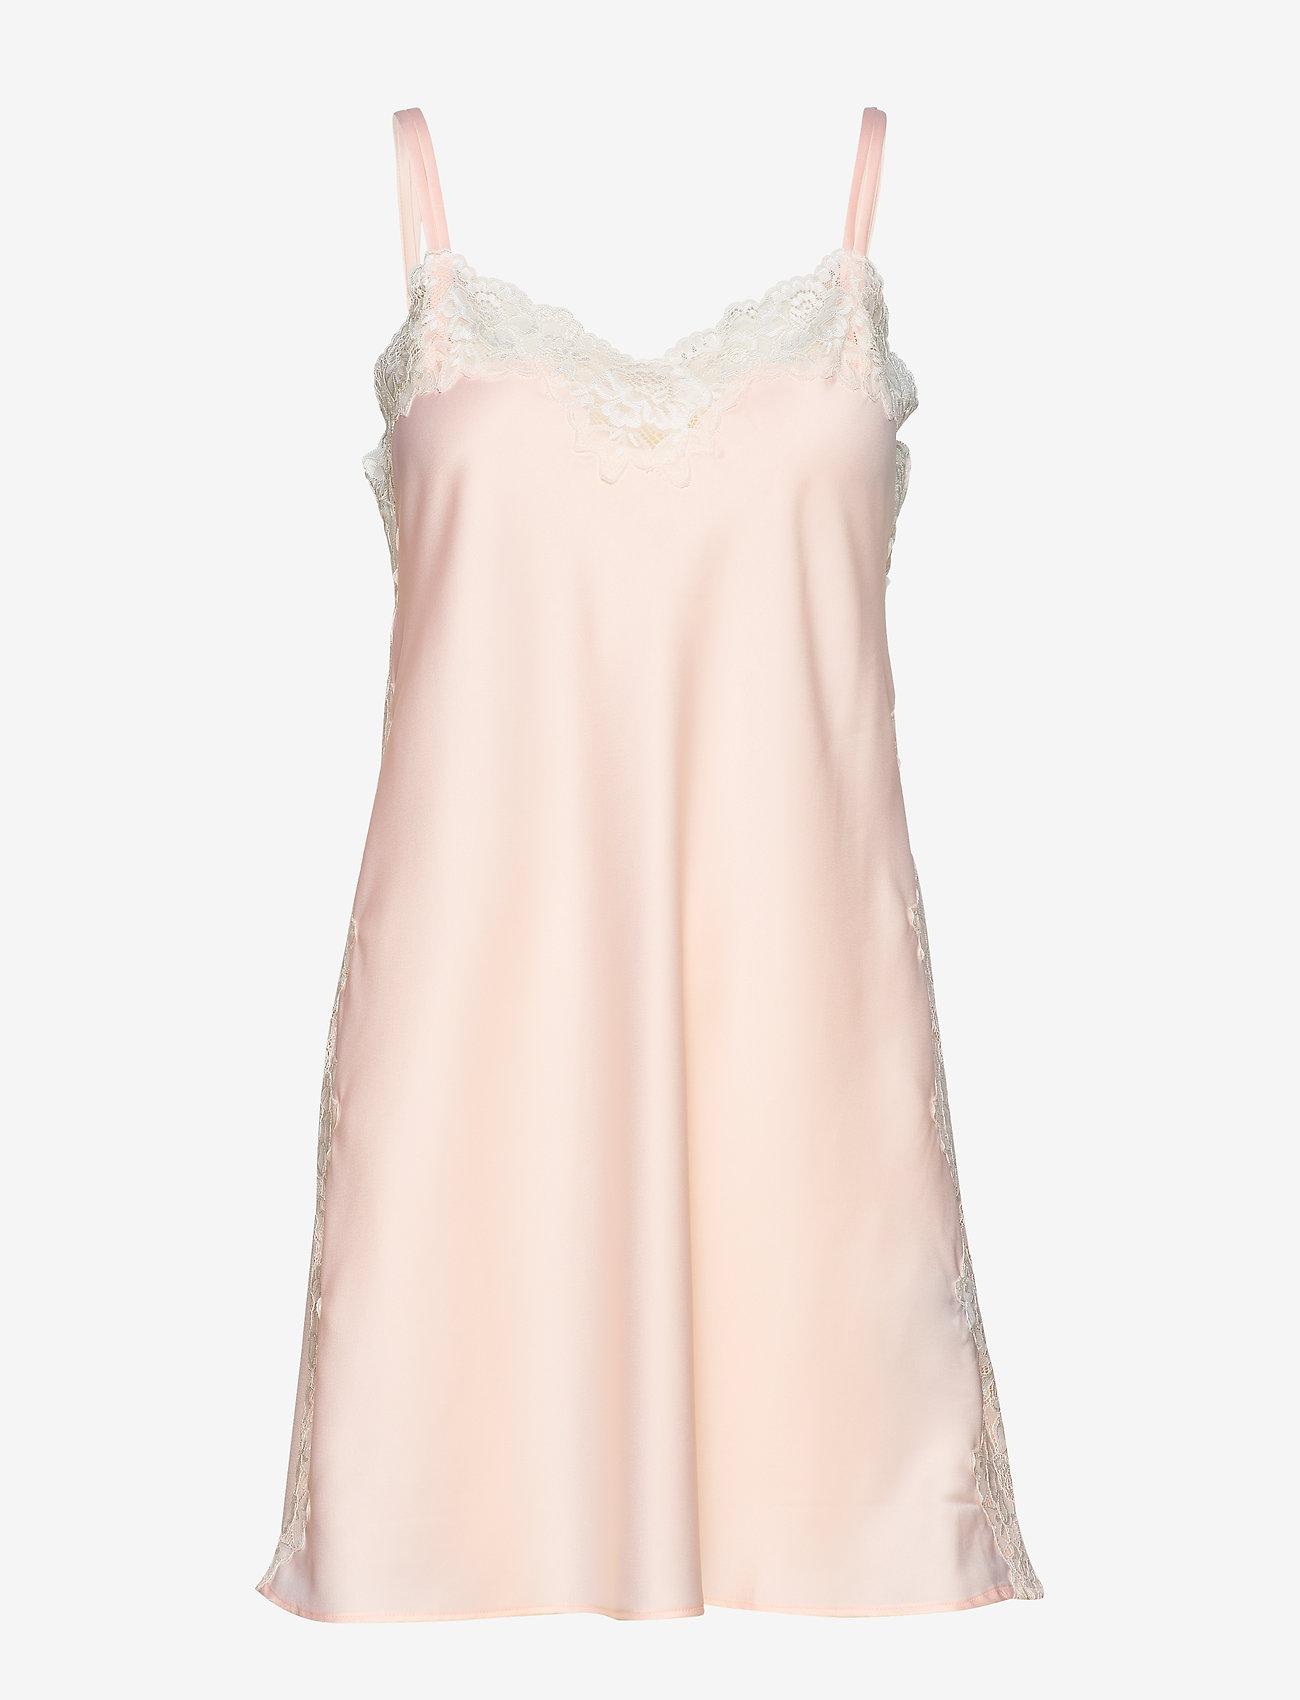 Lauren Ralph Lauren Homewear - LRL SIGNATURE LACE CHEMISE - natkjoler - pink - 0